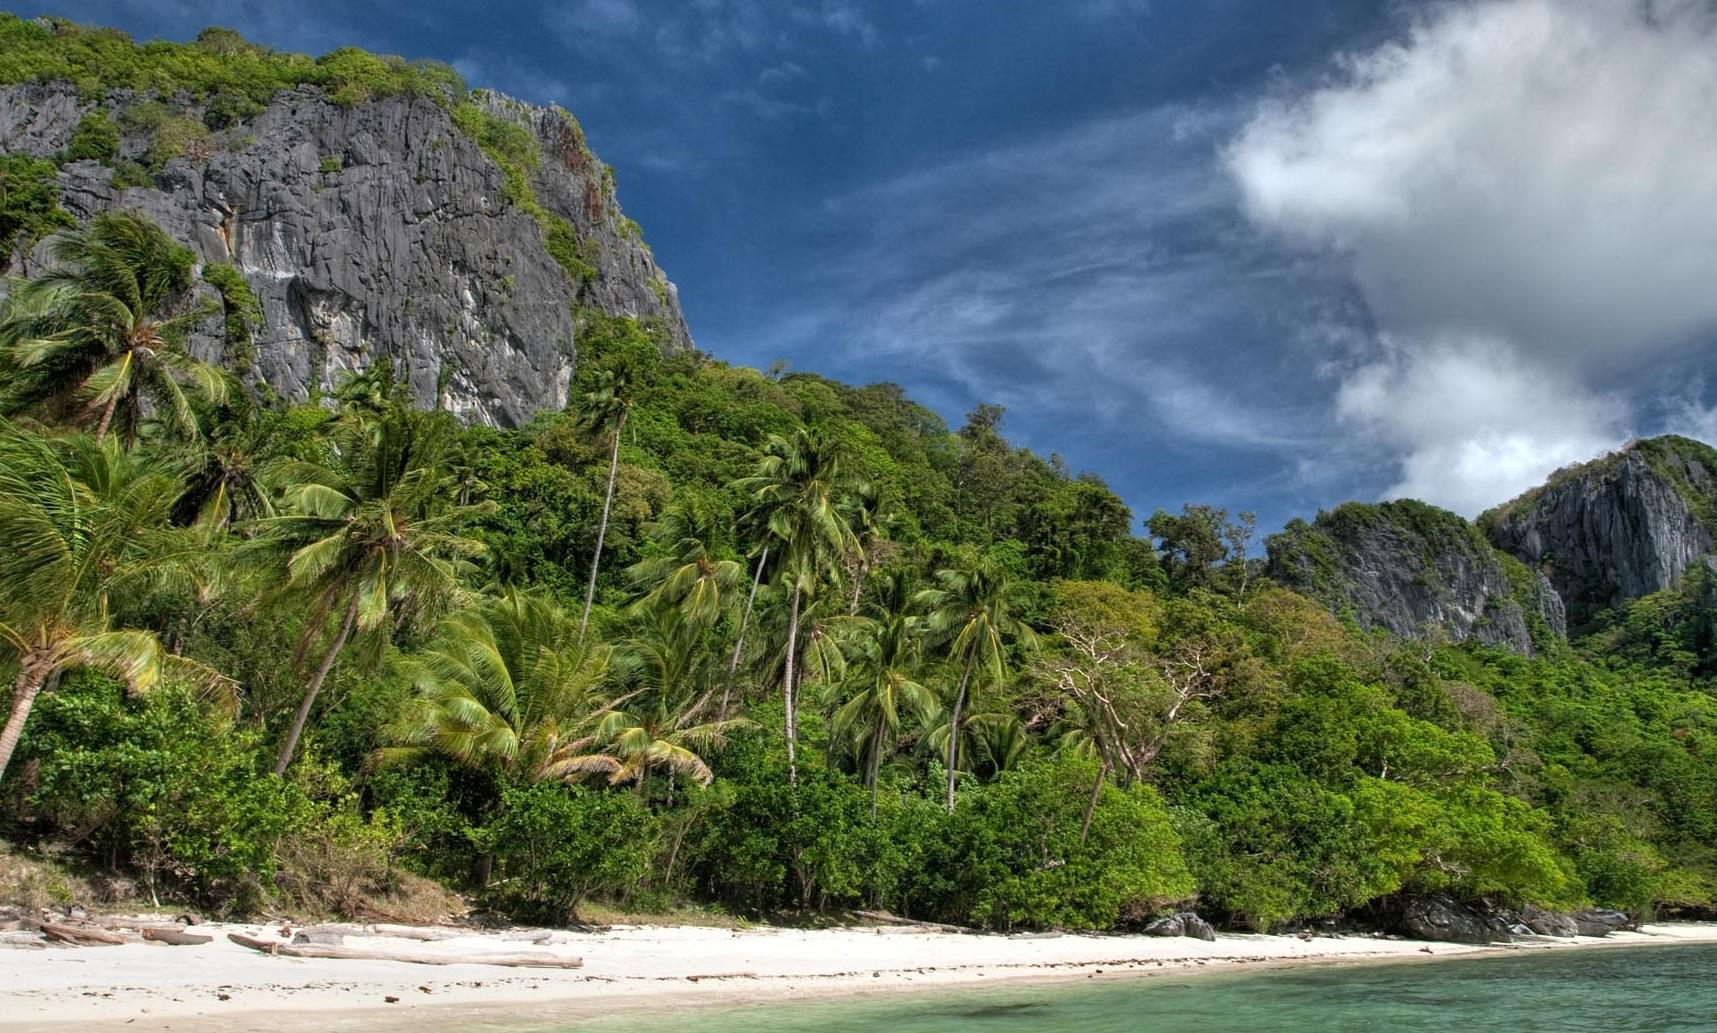 NatNat Beach in El Nido, Tour D Palawan